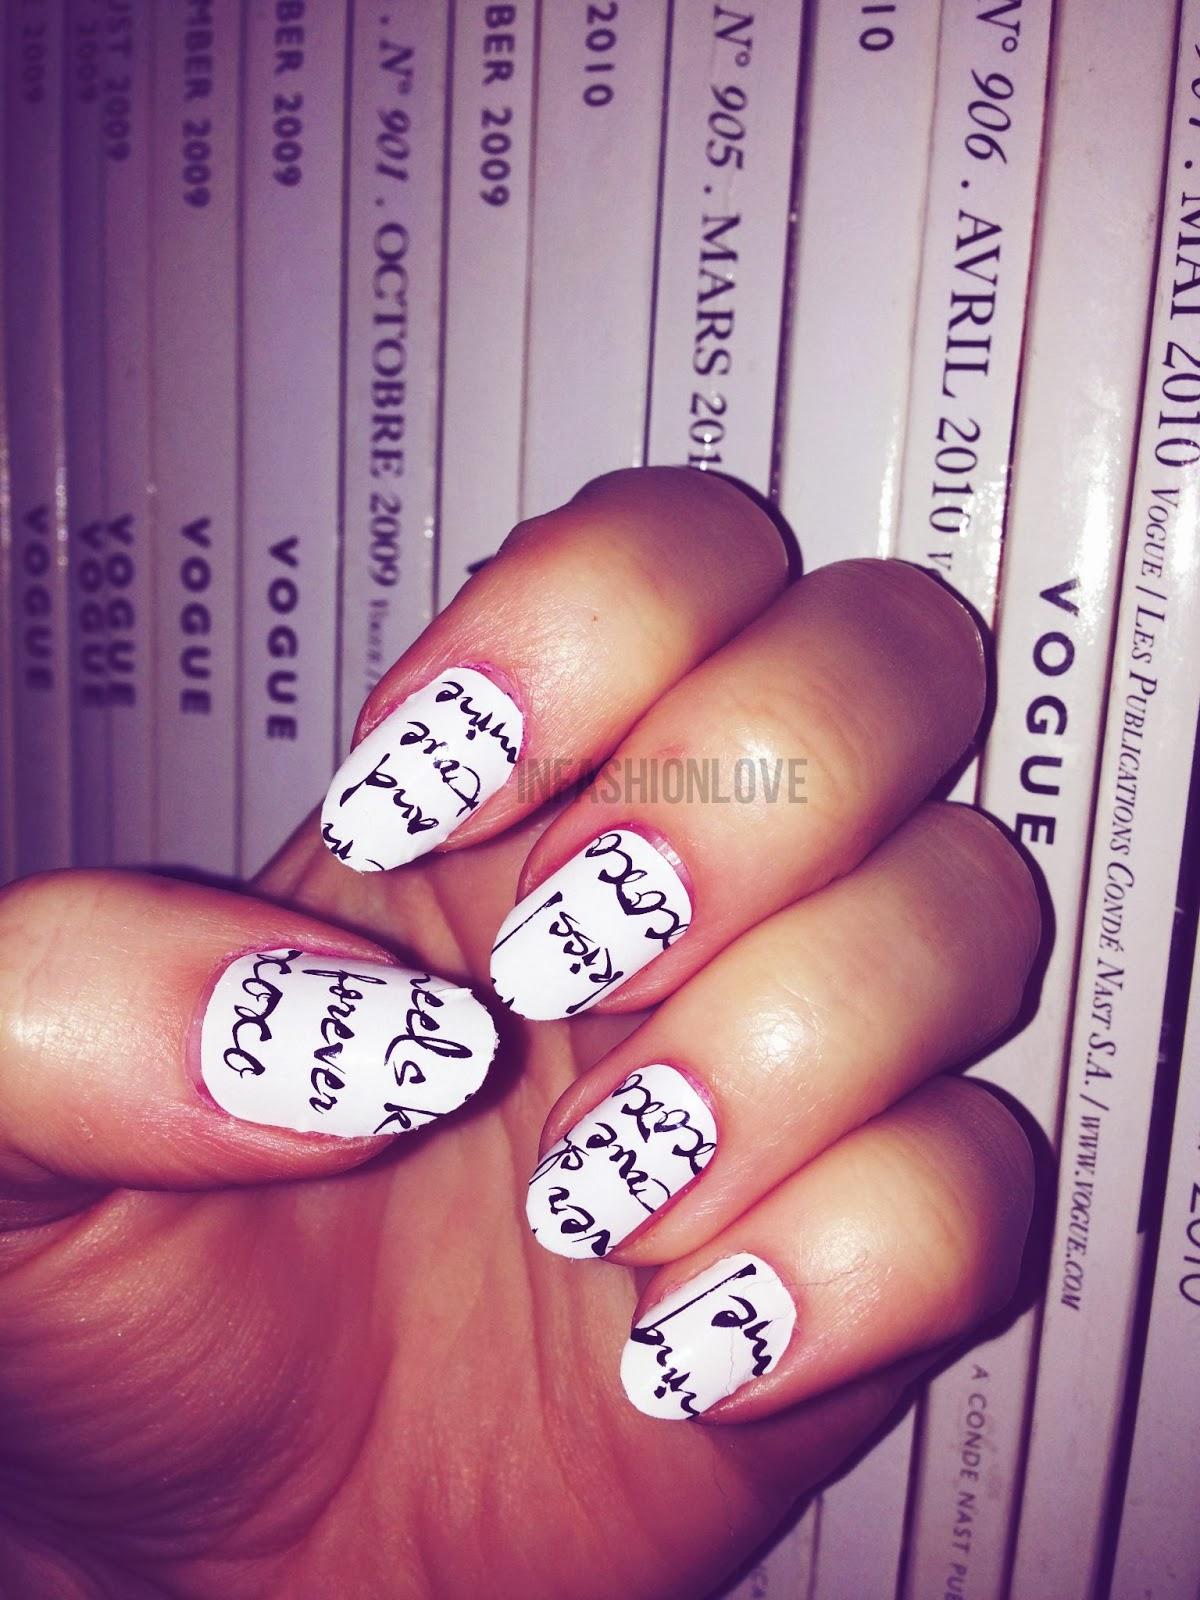 INFASHIONLOVE.COM: Essie Sleek Stick Nail Stickers in Love to Love You!